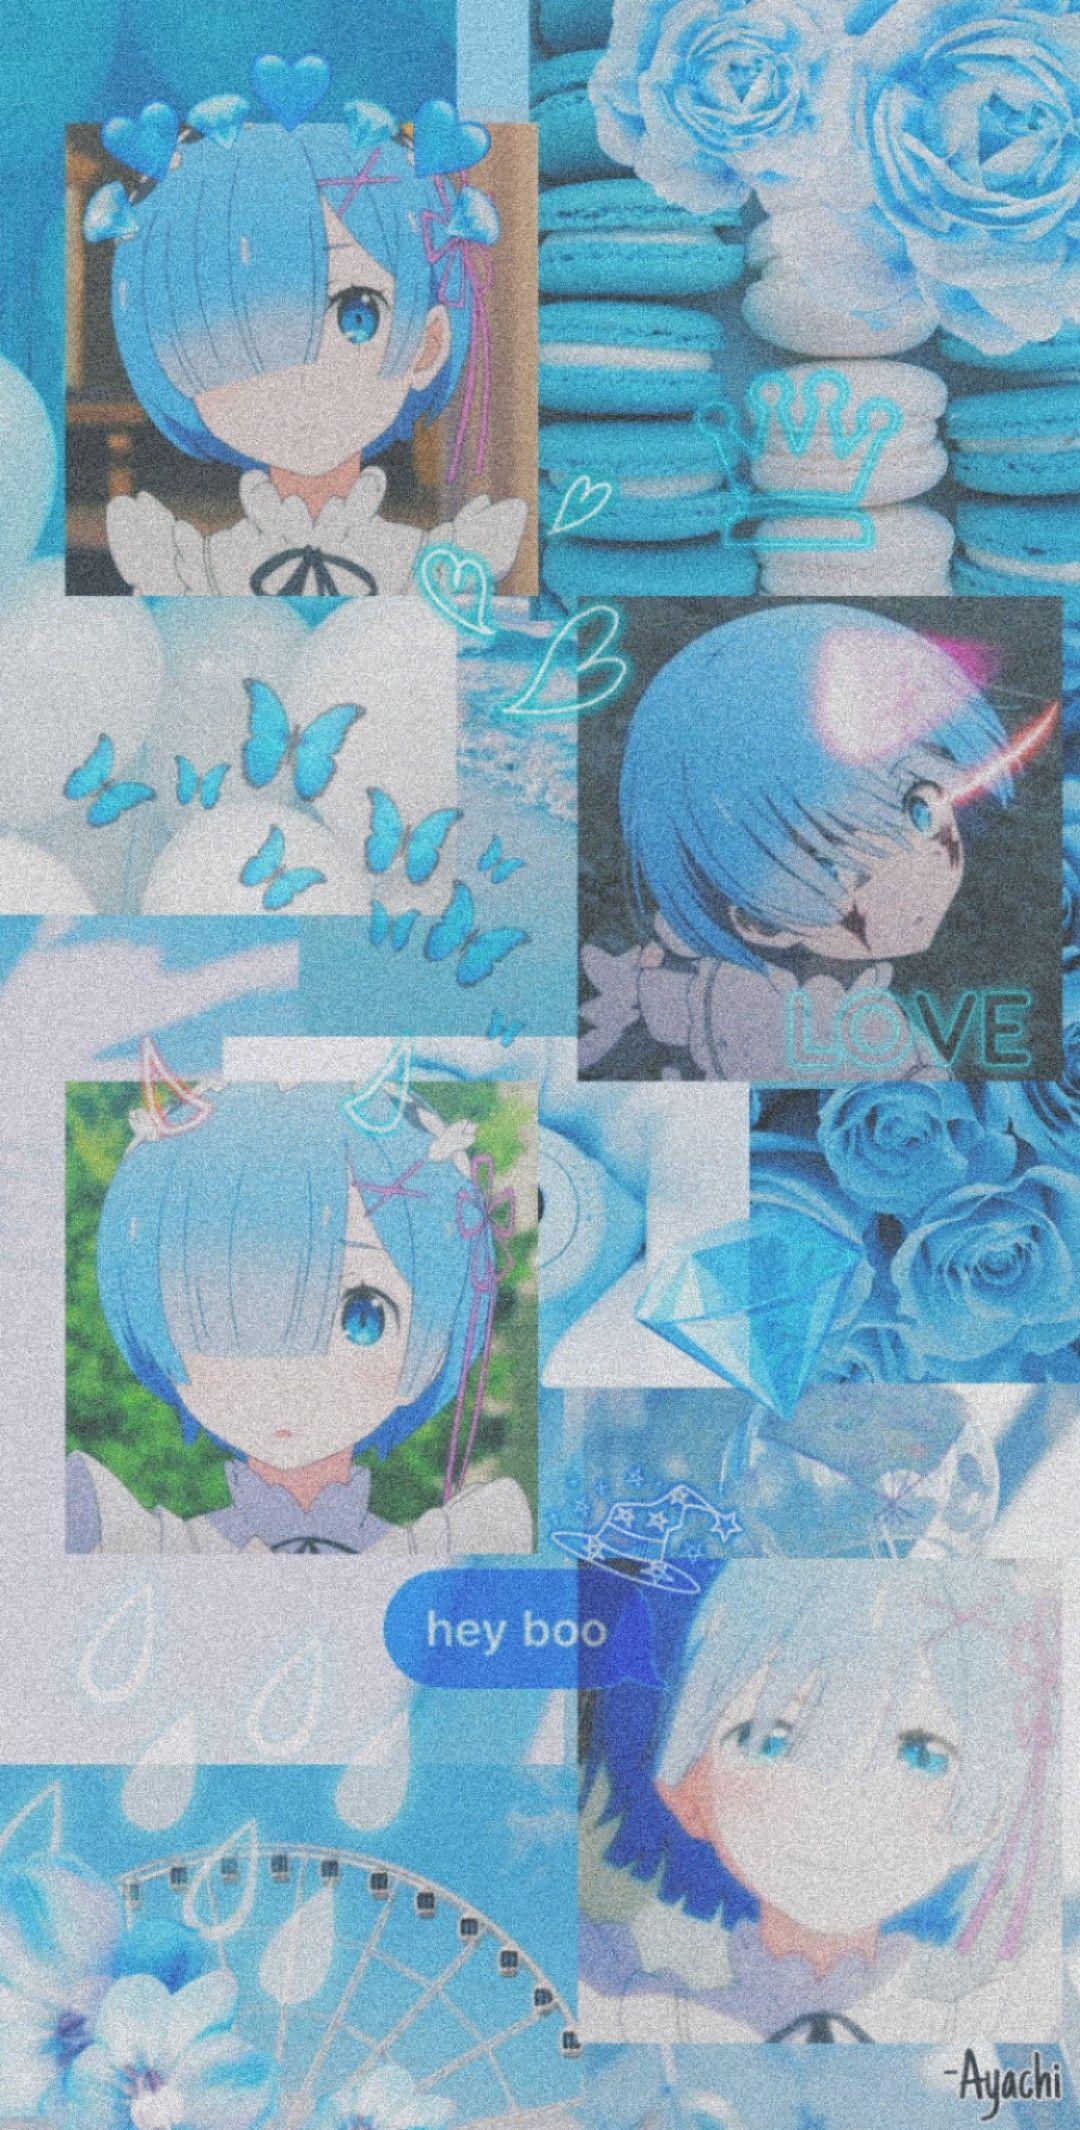 Rem Re Zero In 2020 Anime Wallpaper Anime Wallpaper Phone Anime Wallpaper Iphone